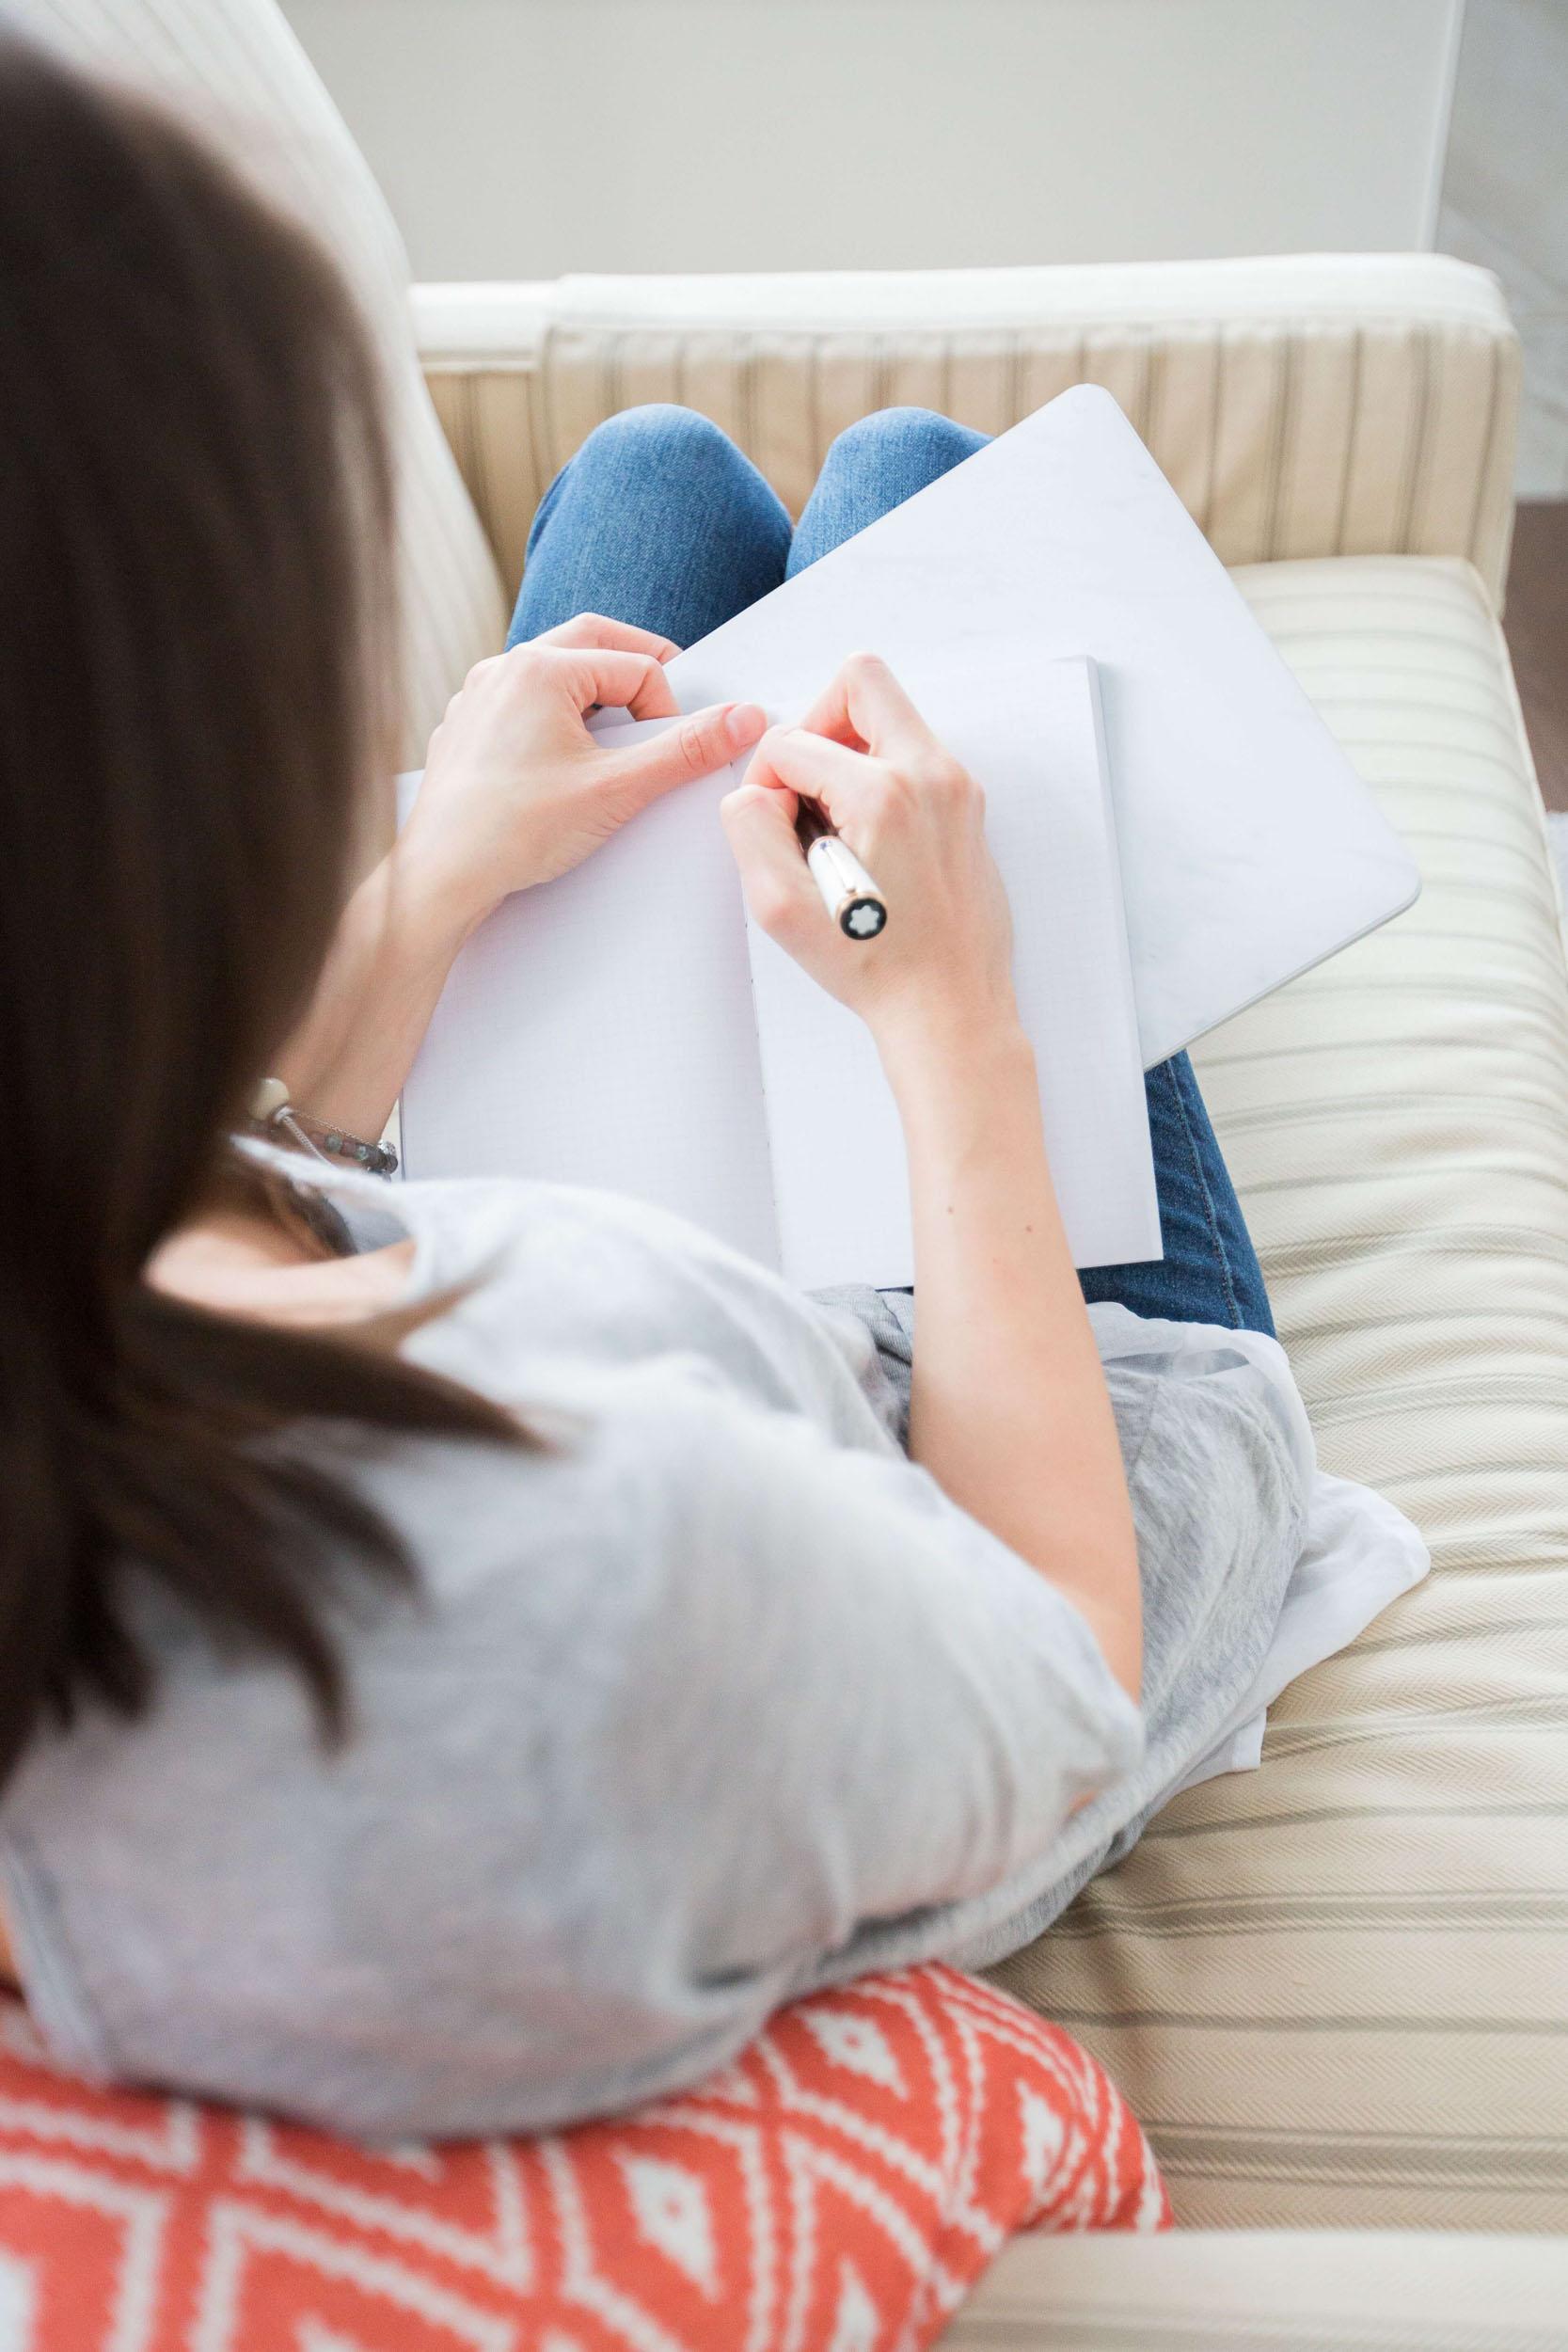 woman starting bullet journal diy planner spread in notebook